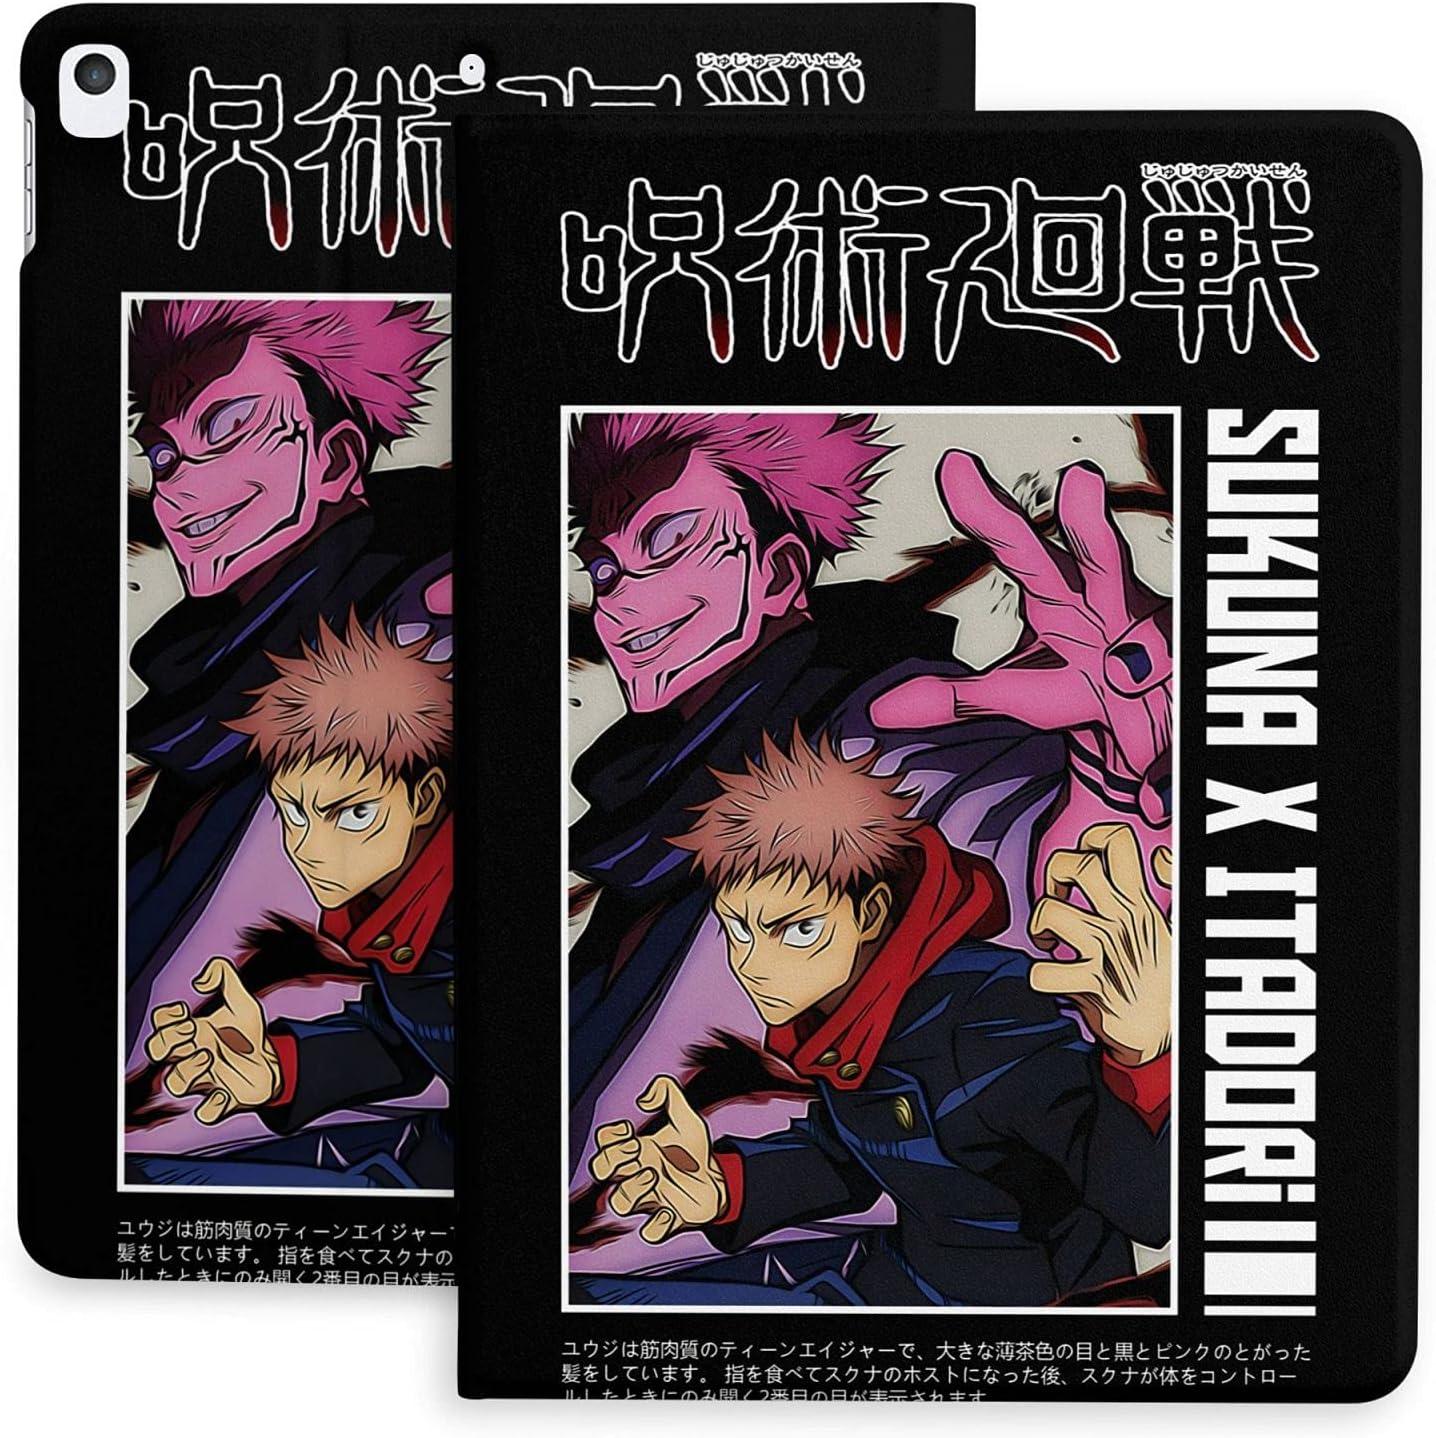 Anime Ipad Case Jujutsu Kaisen Yuji 2020 Itadori Cheap mail order sales Retro Over item handling ☆